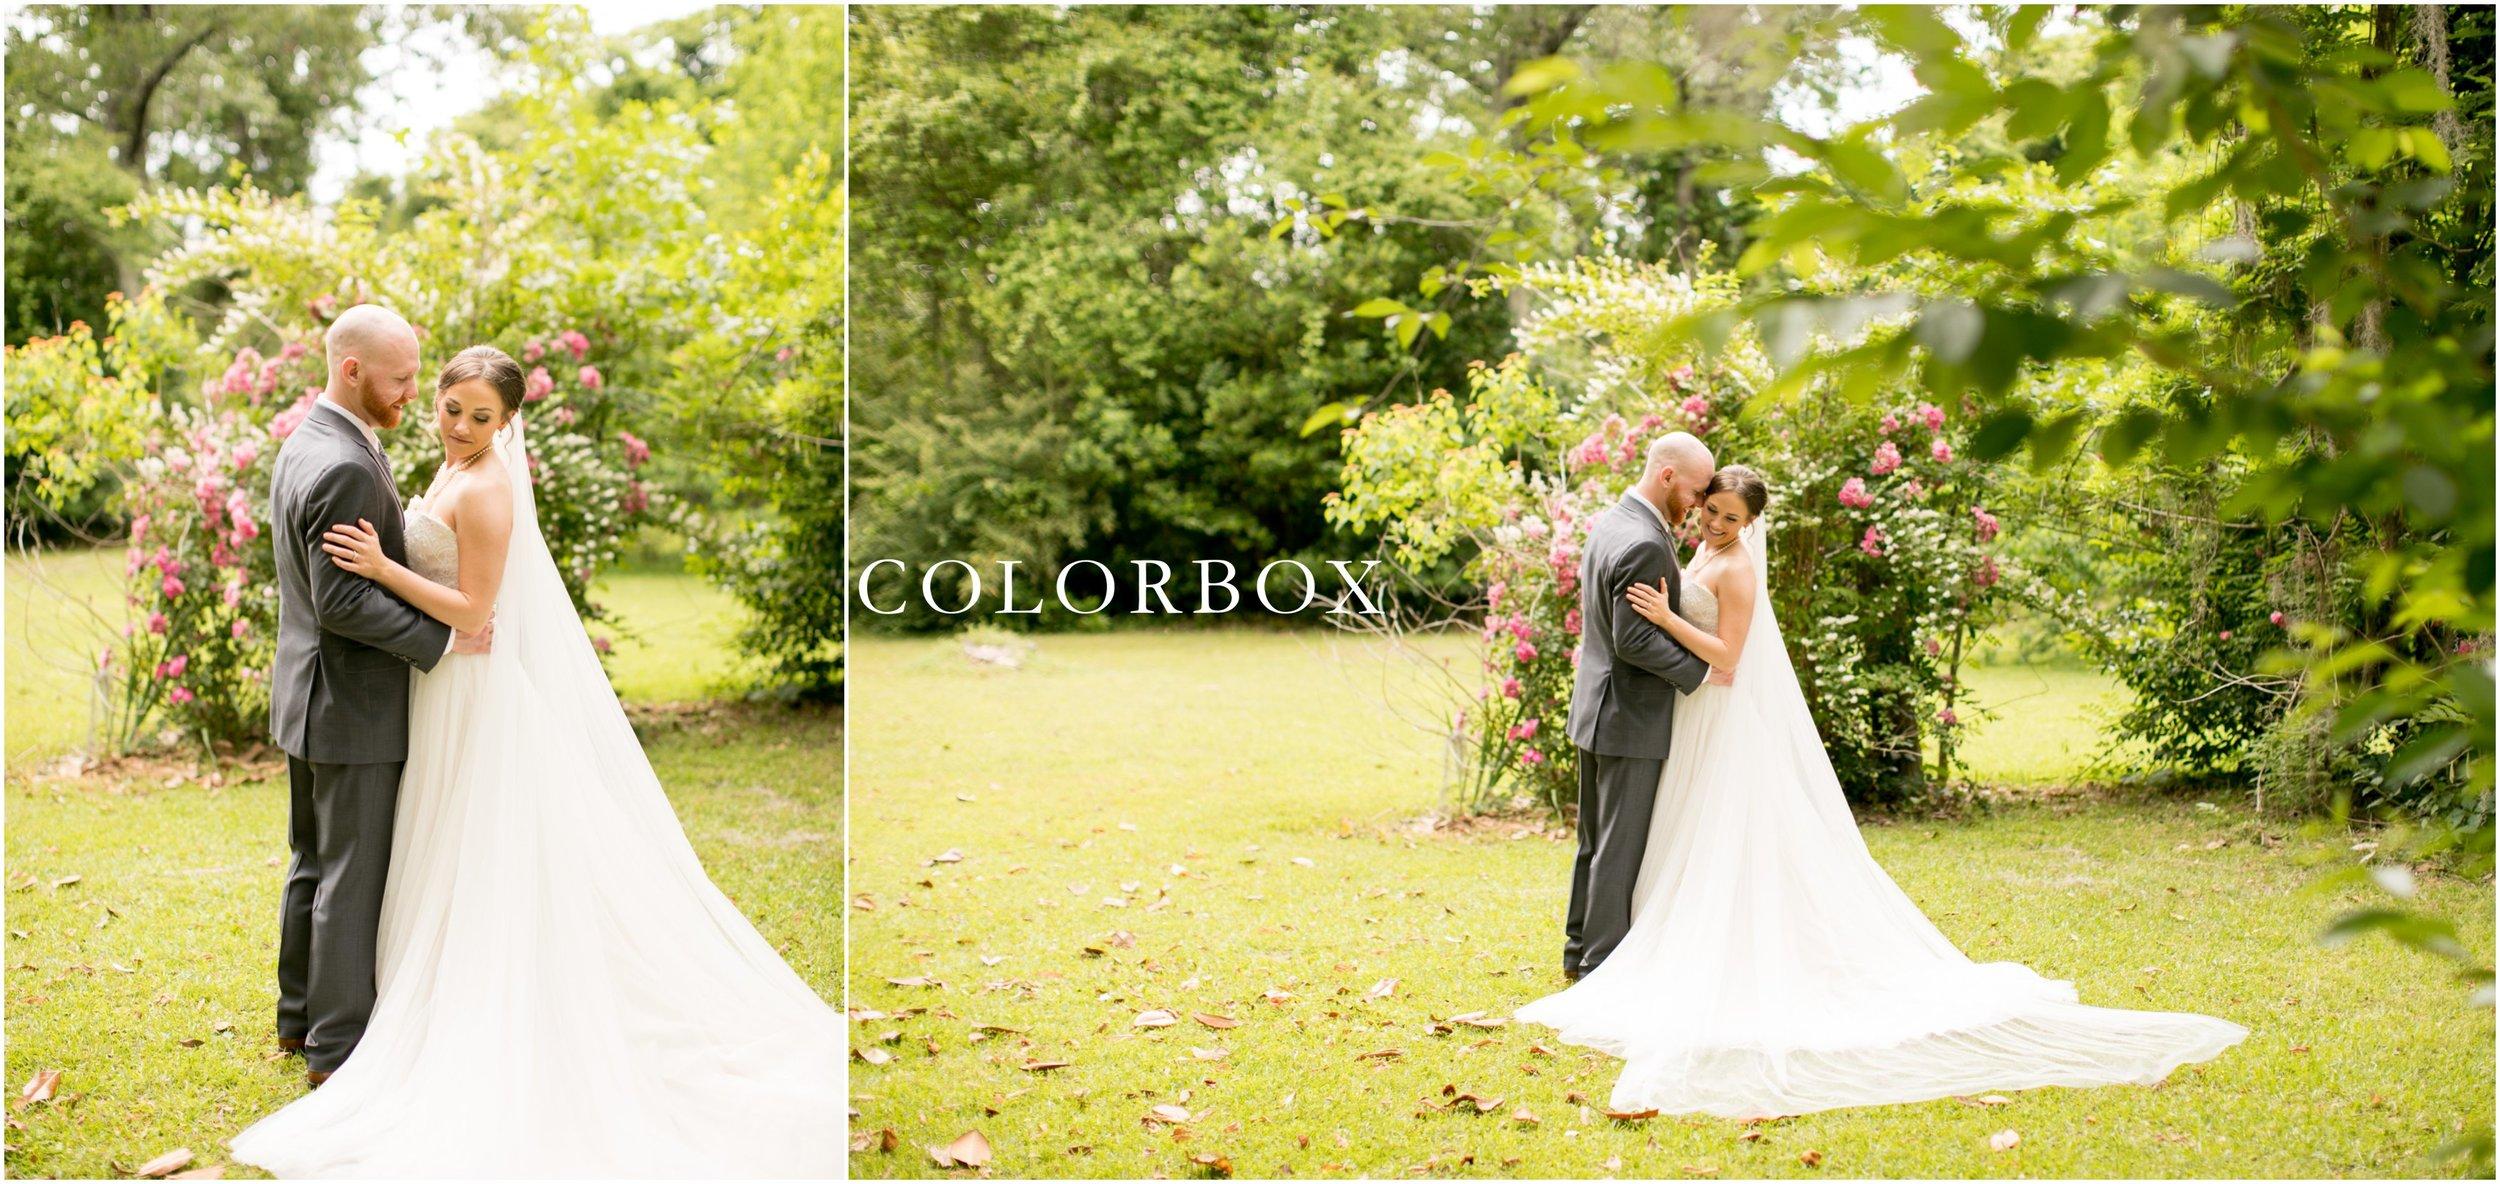 colorboxphotographers_5910.jpg